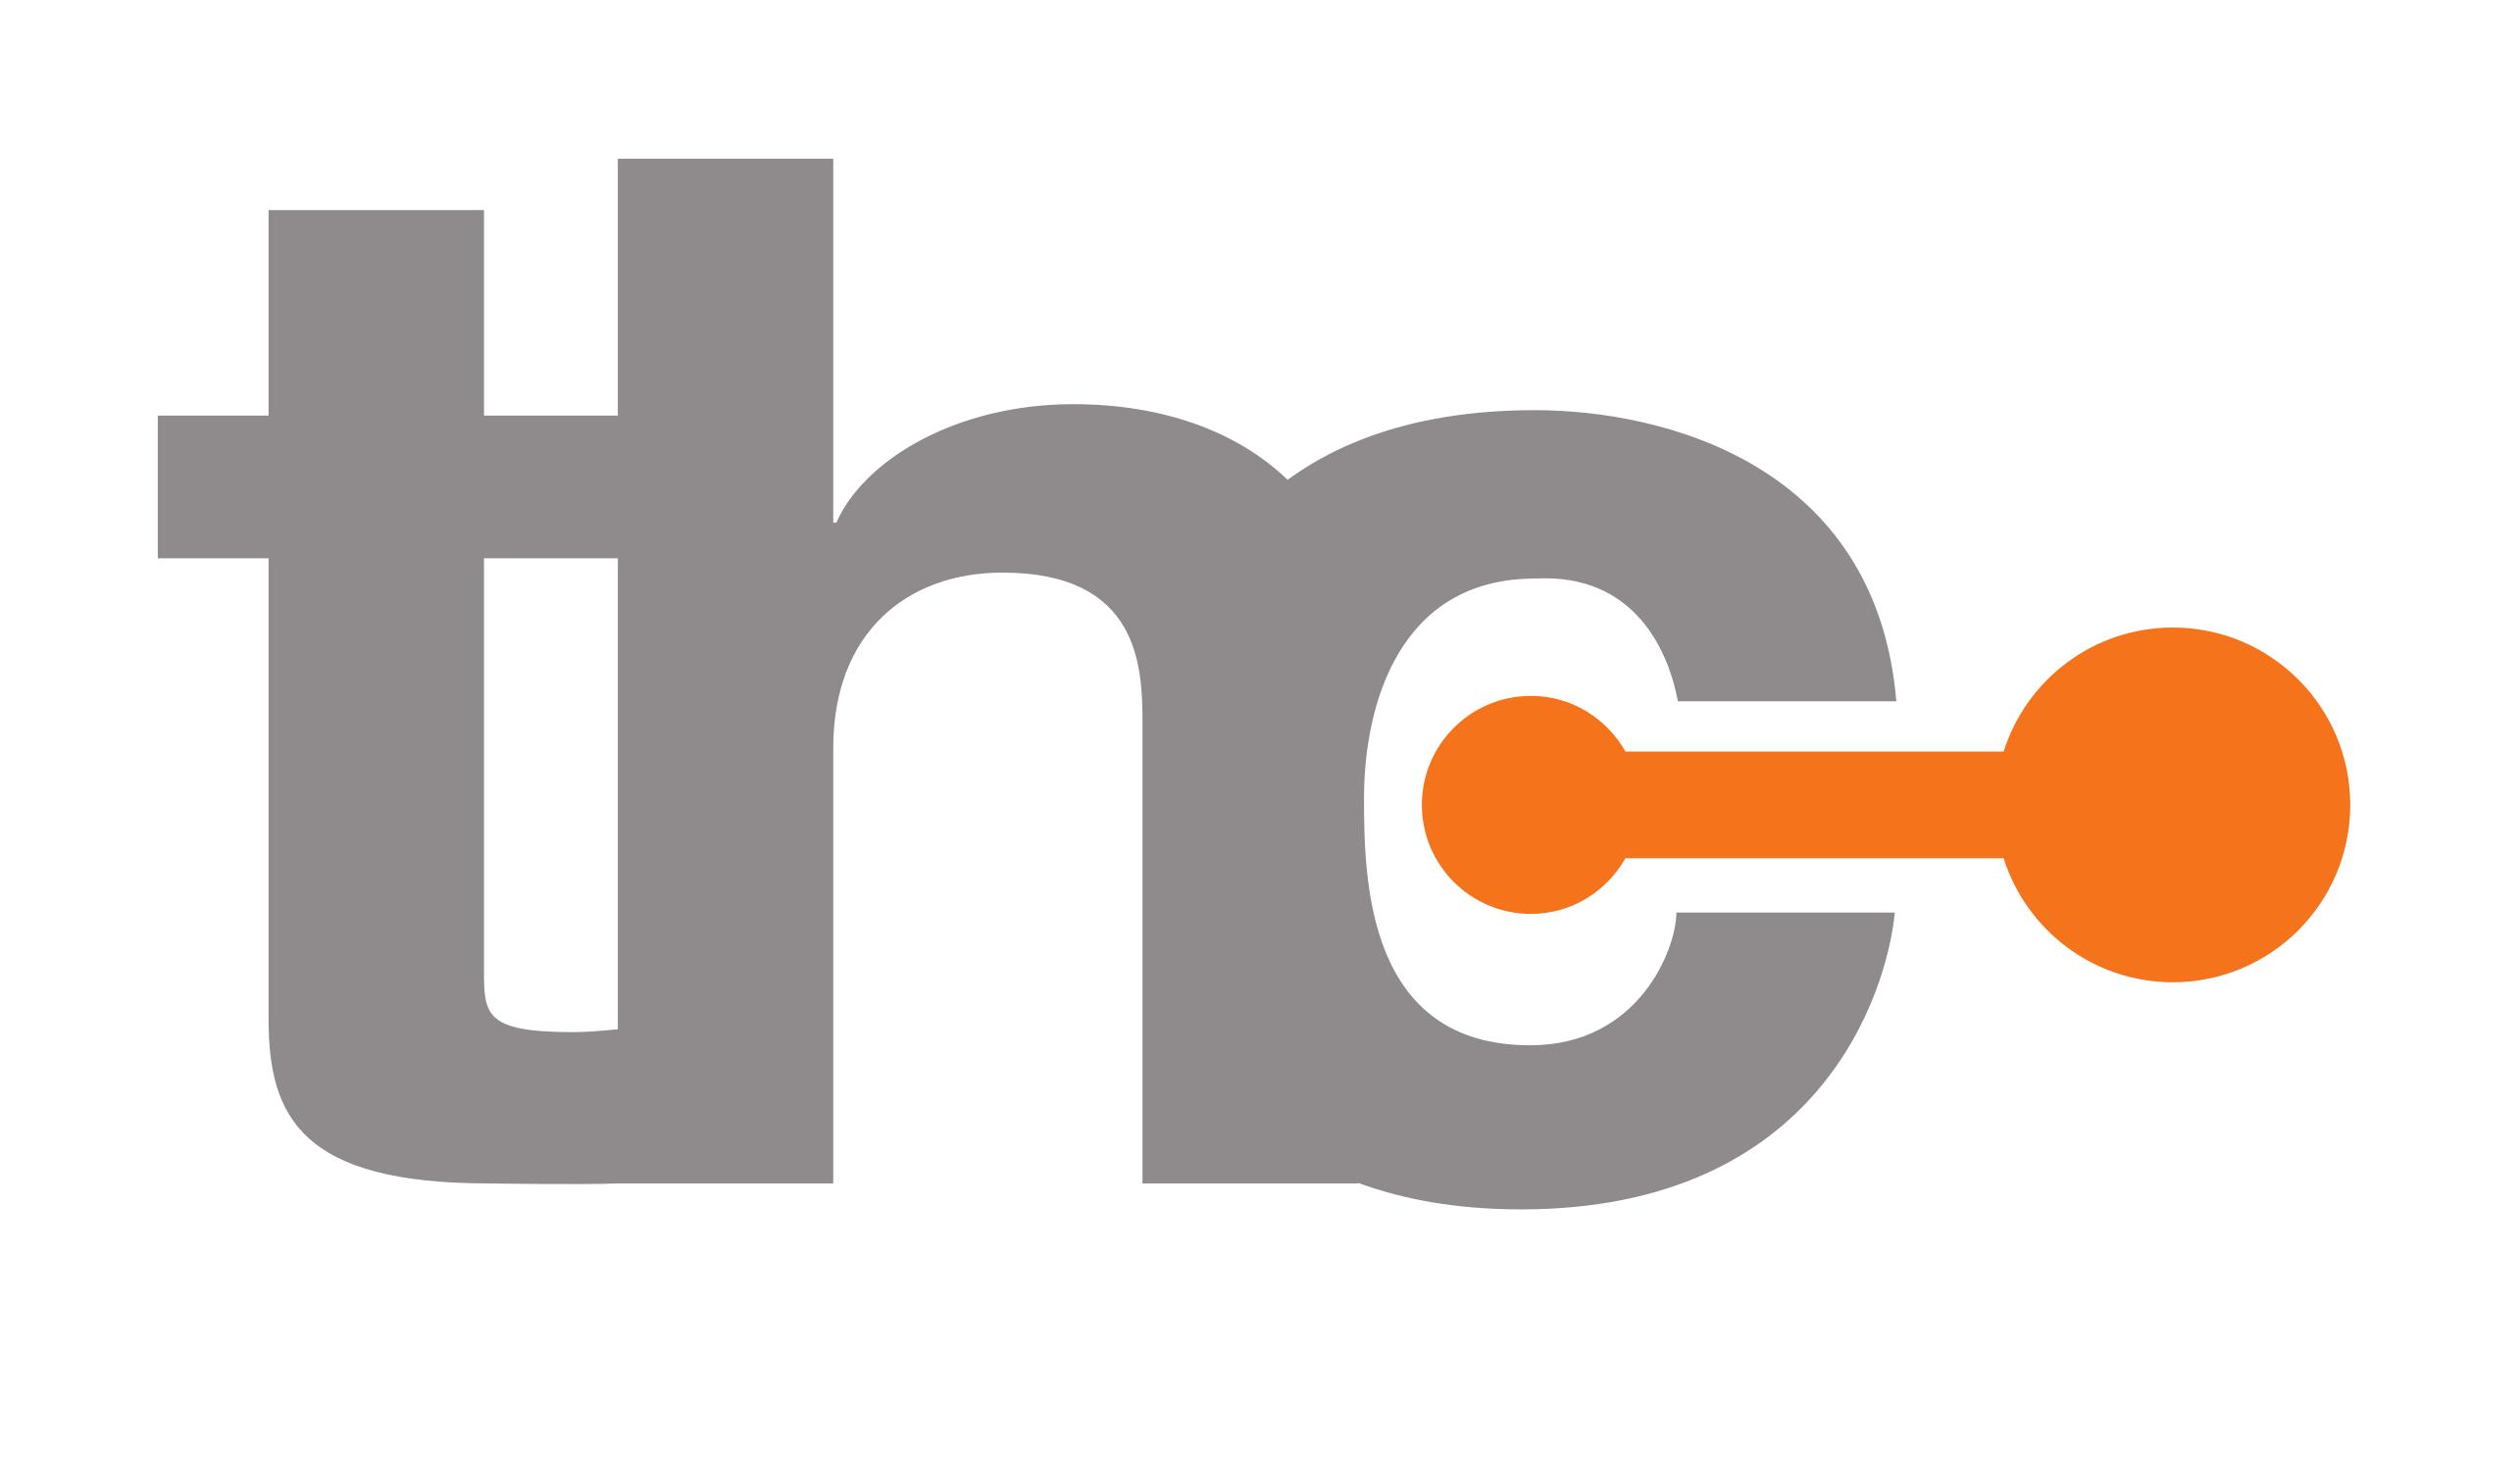 Logo THC